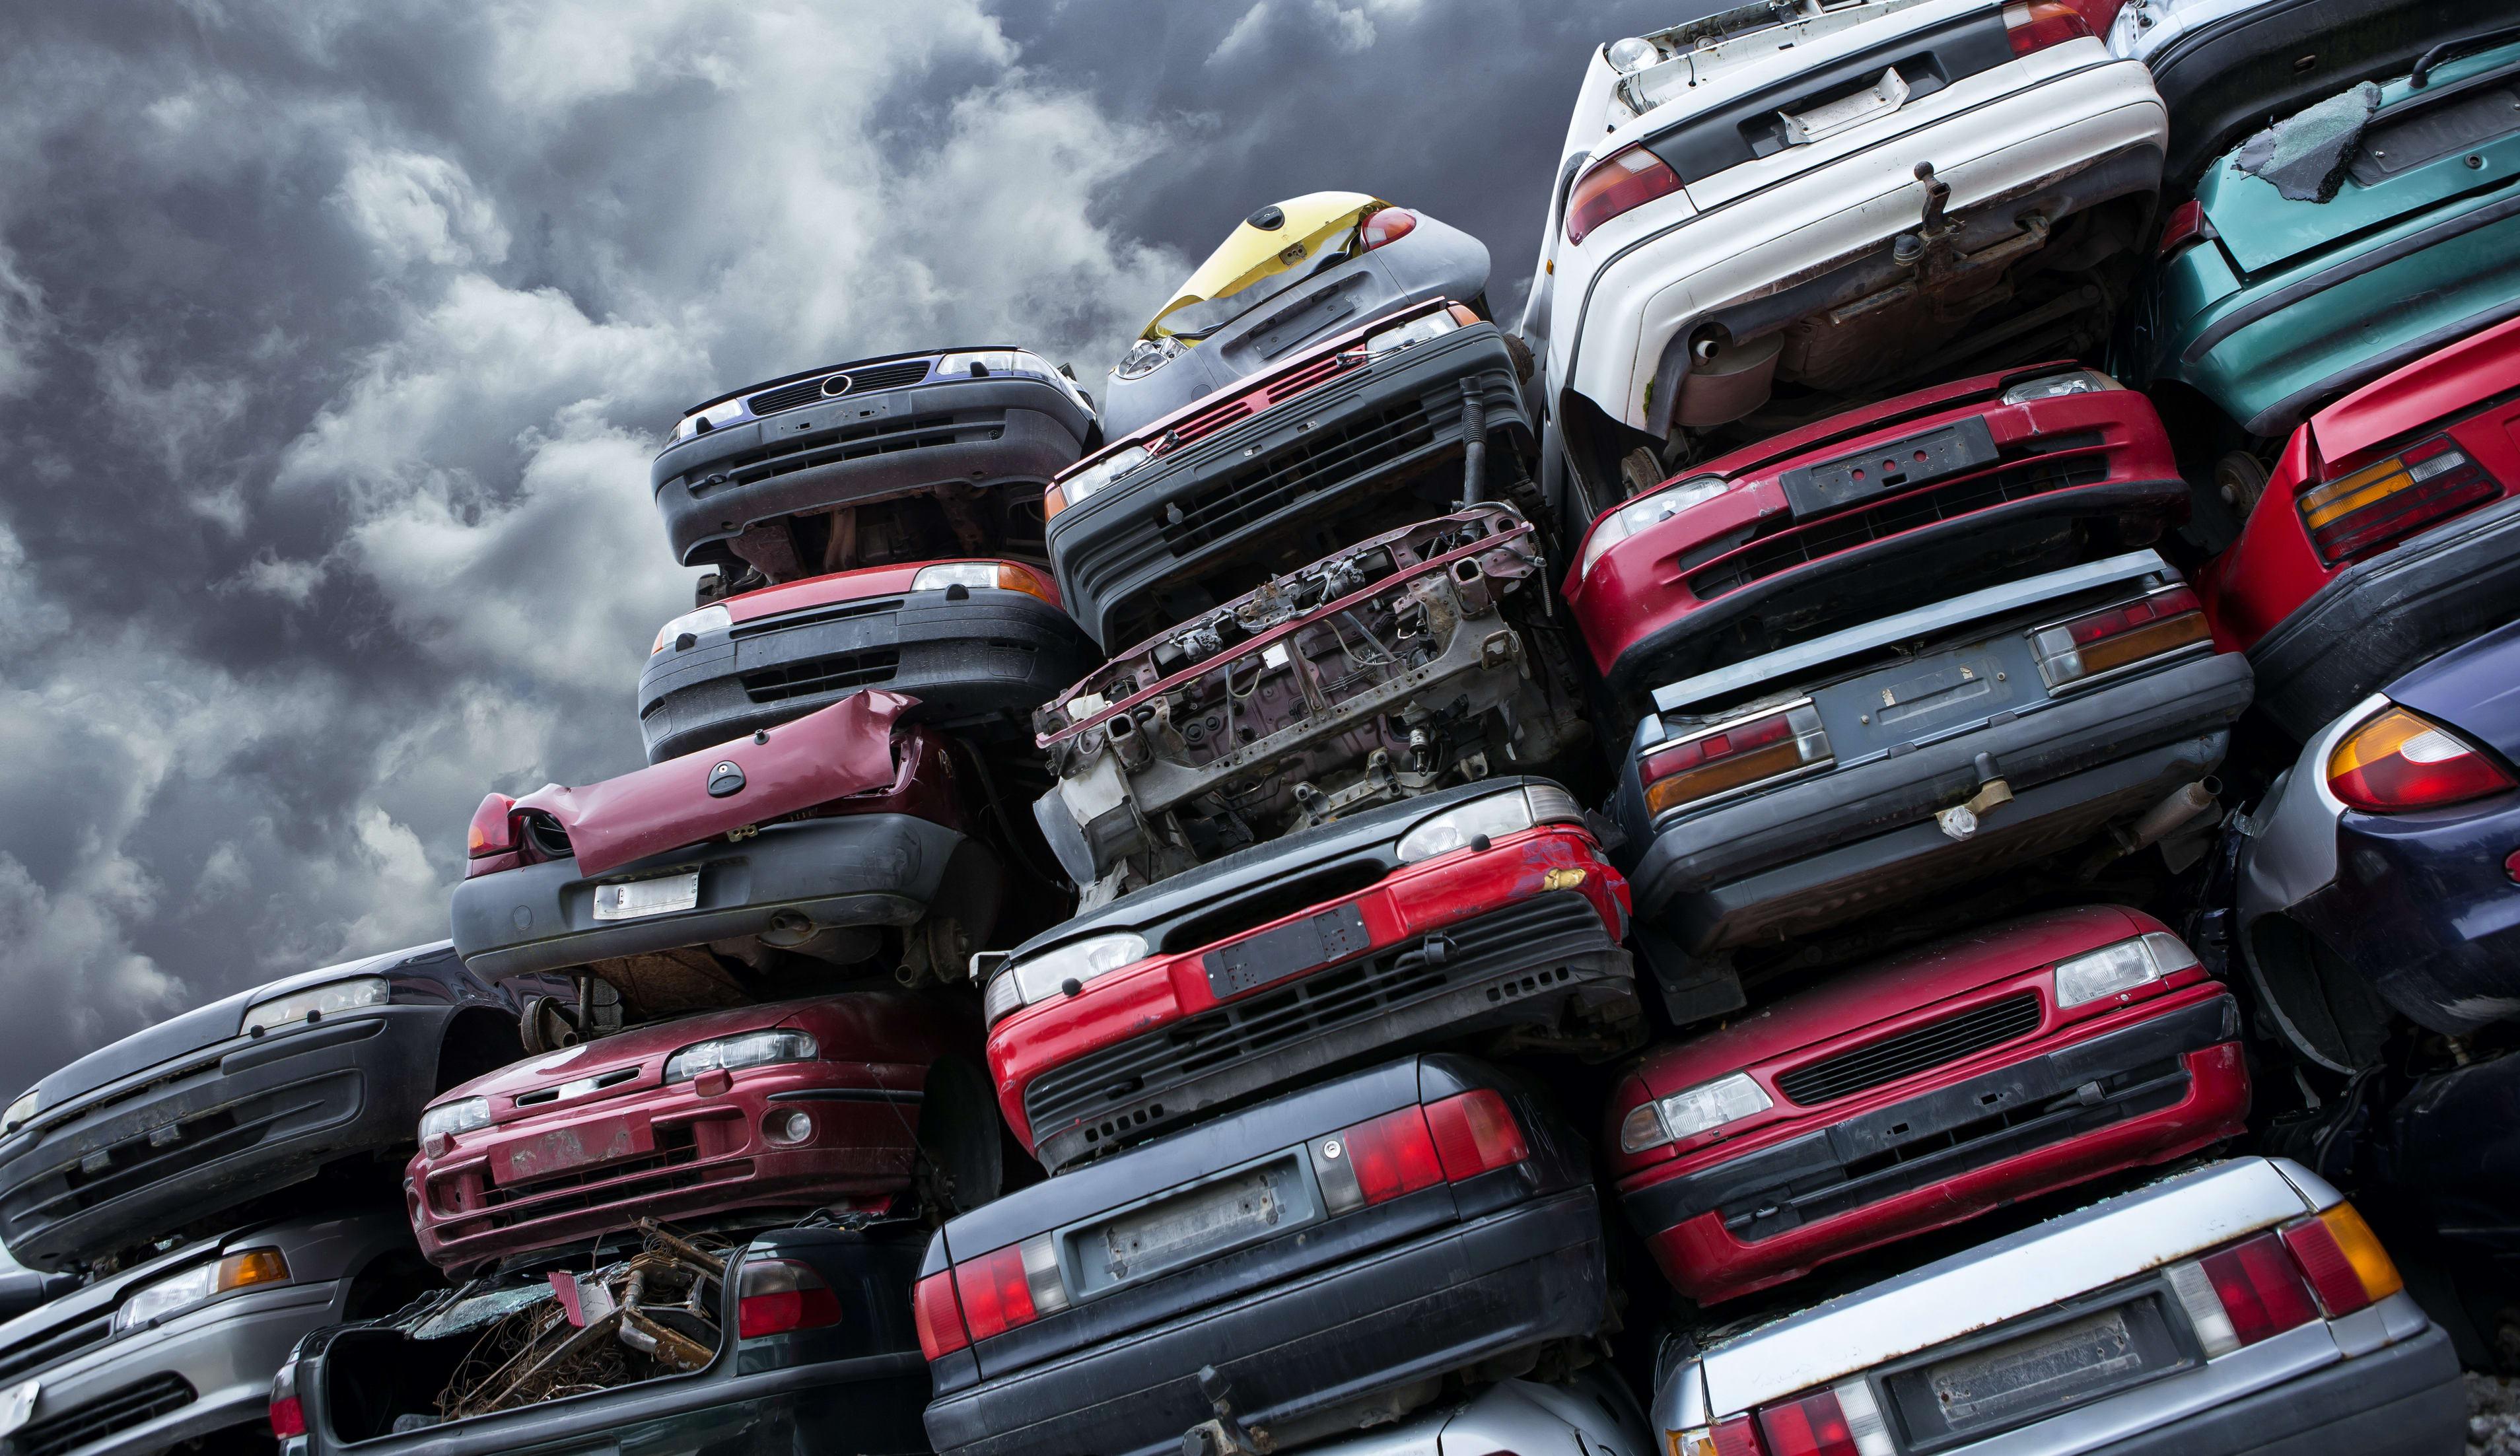 Cash for clunkers: Victorian Government announces pilot program